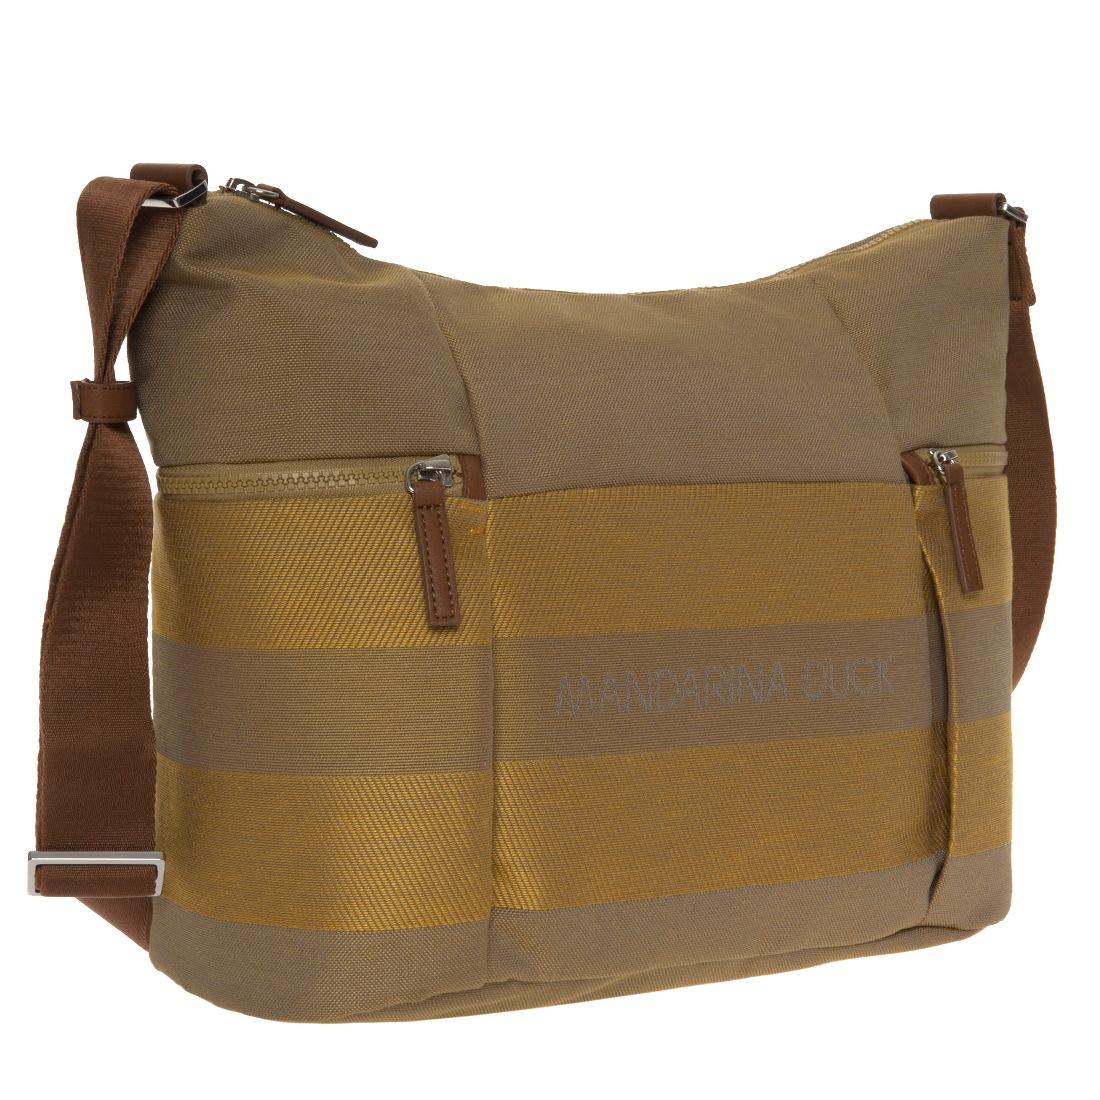 72e1108ae1 MANDARINA DUCK Borsa a Spalla SPEAK IIT01 Golden Yellow - Bagsabout